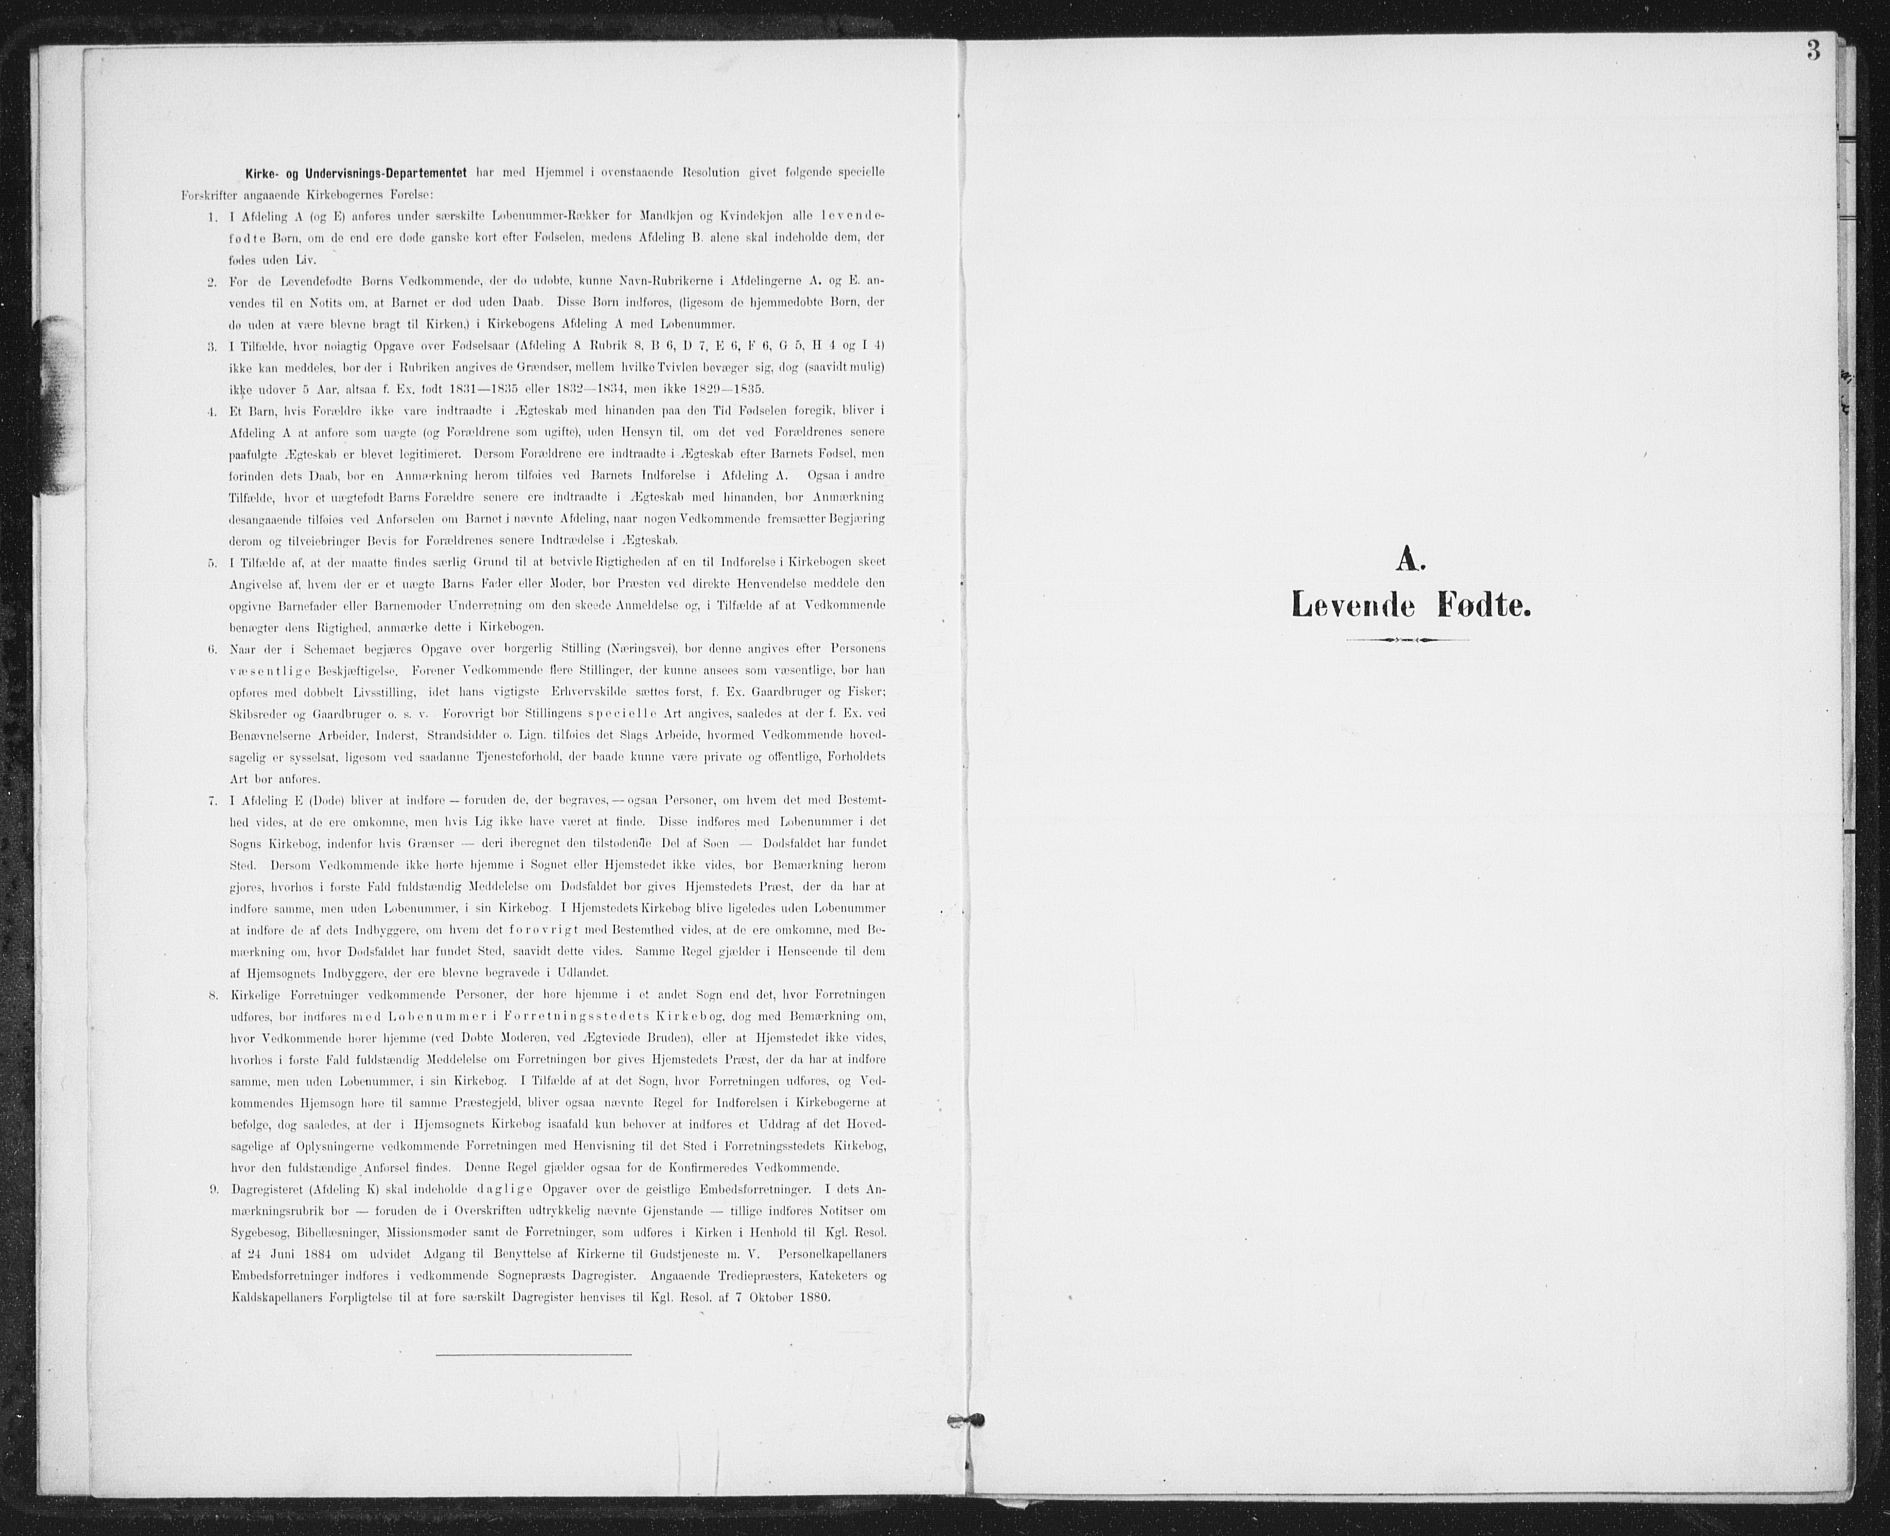 SAT, Ministerialprotokoller, klokkerbøker og fødselsregistre - Nordland, 899/L1437: Ministerialbok nr. 899A05, 1897-1908, s. 3